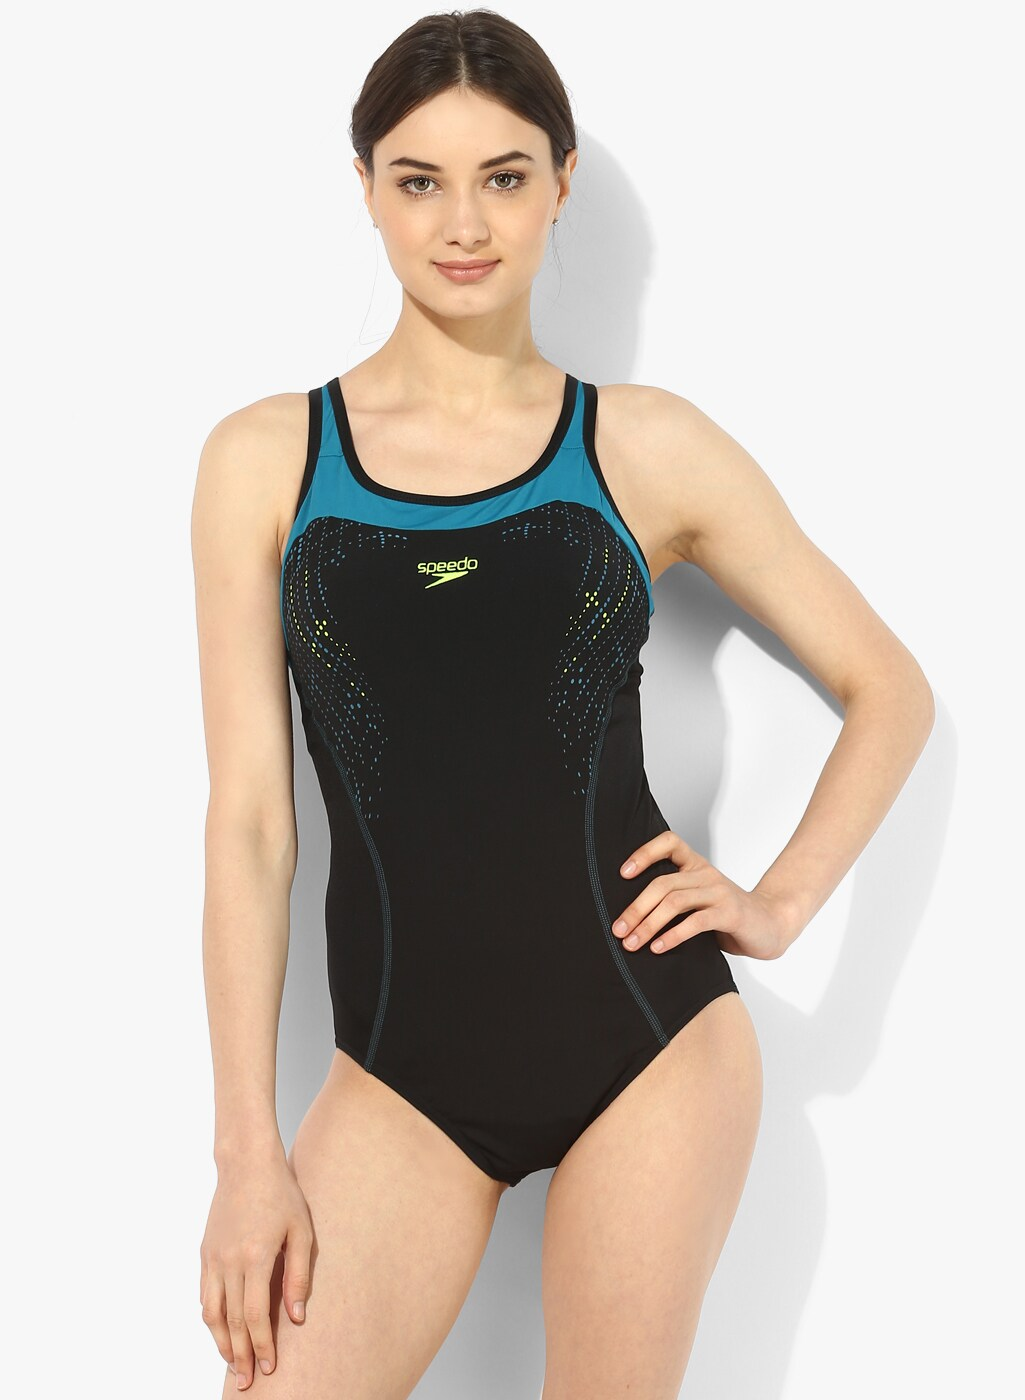 70913278de Speedo Racerback Black Swimsuit for women price in India on 19th ...